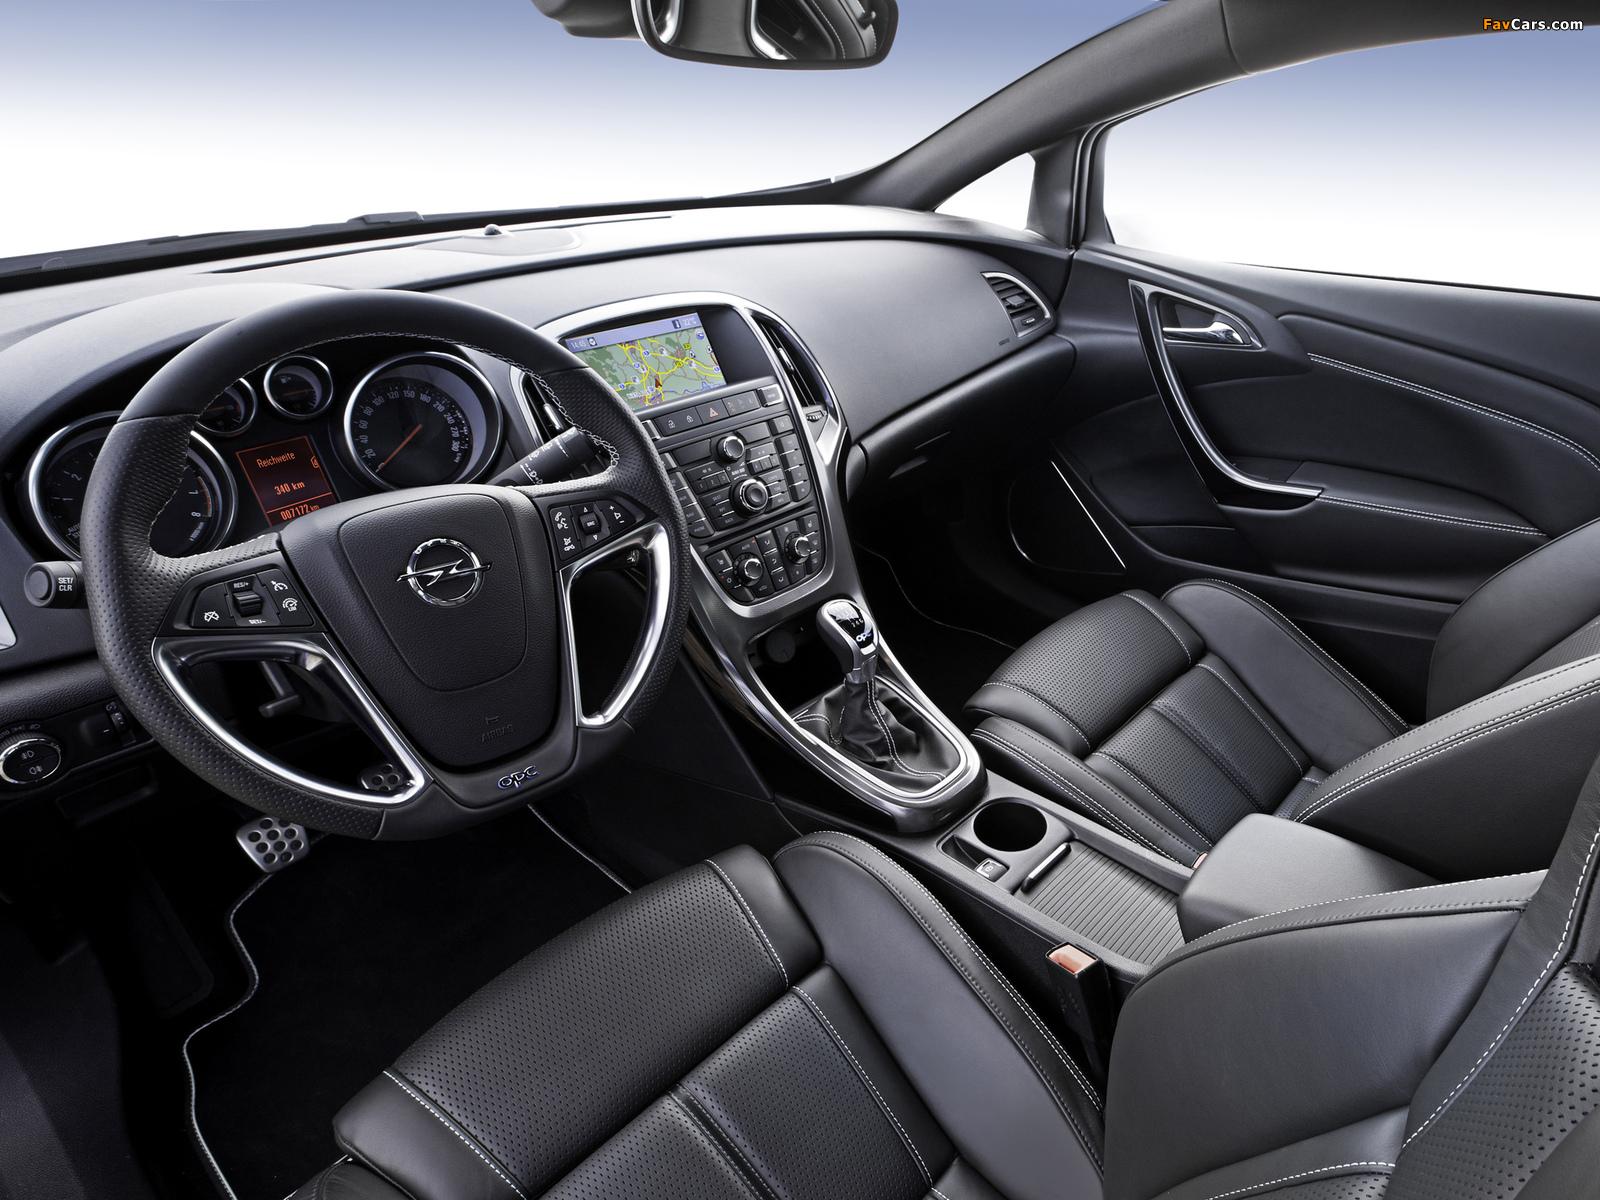 Opel Astra OPC (J) 2011 photos (1600 x 1200)